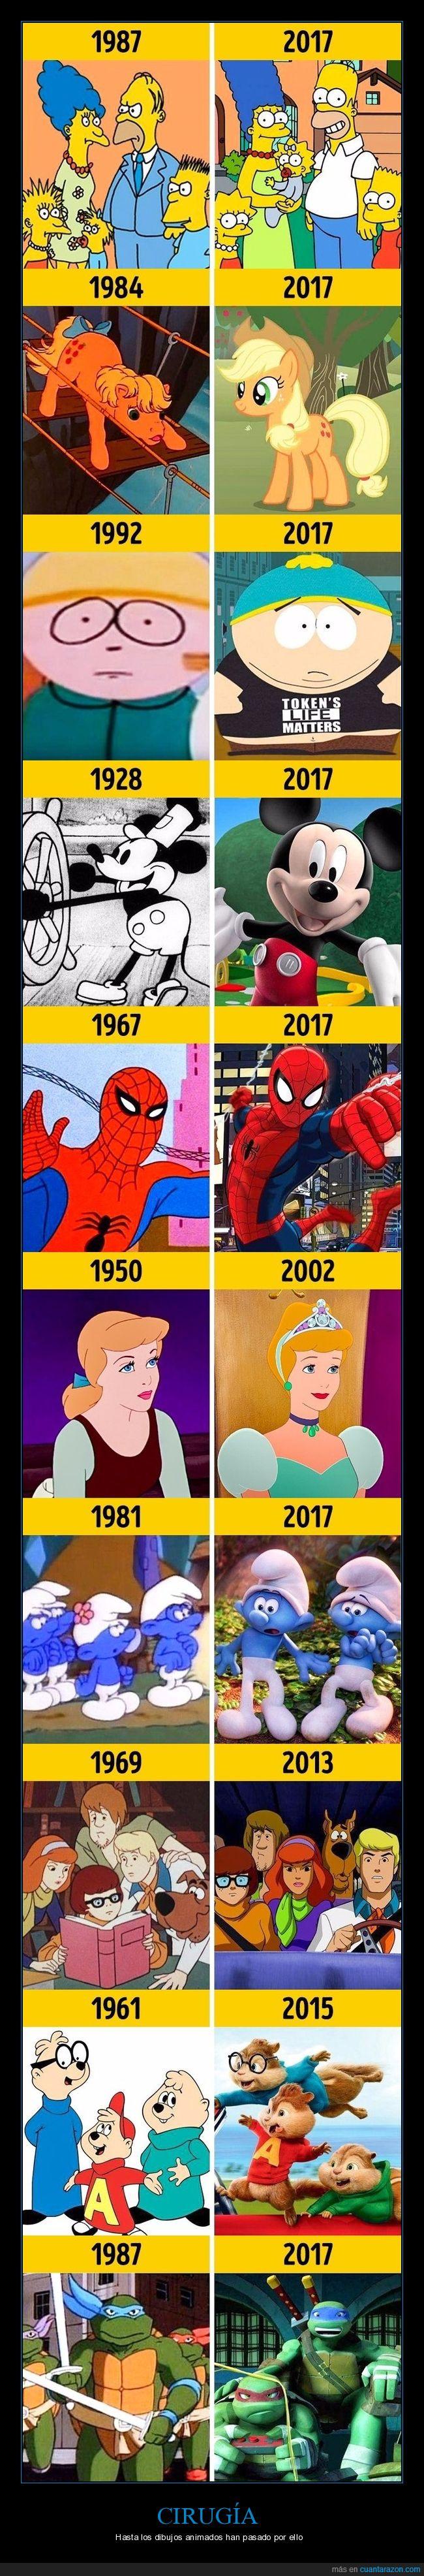 ahora,antes,cambio,cgi,dibujos animados